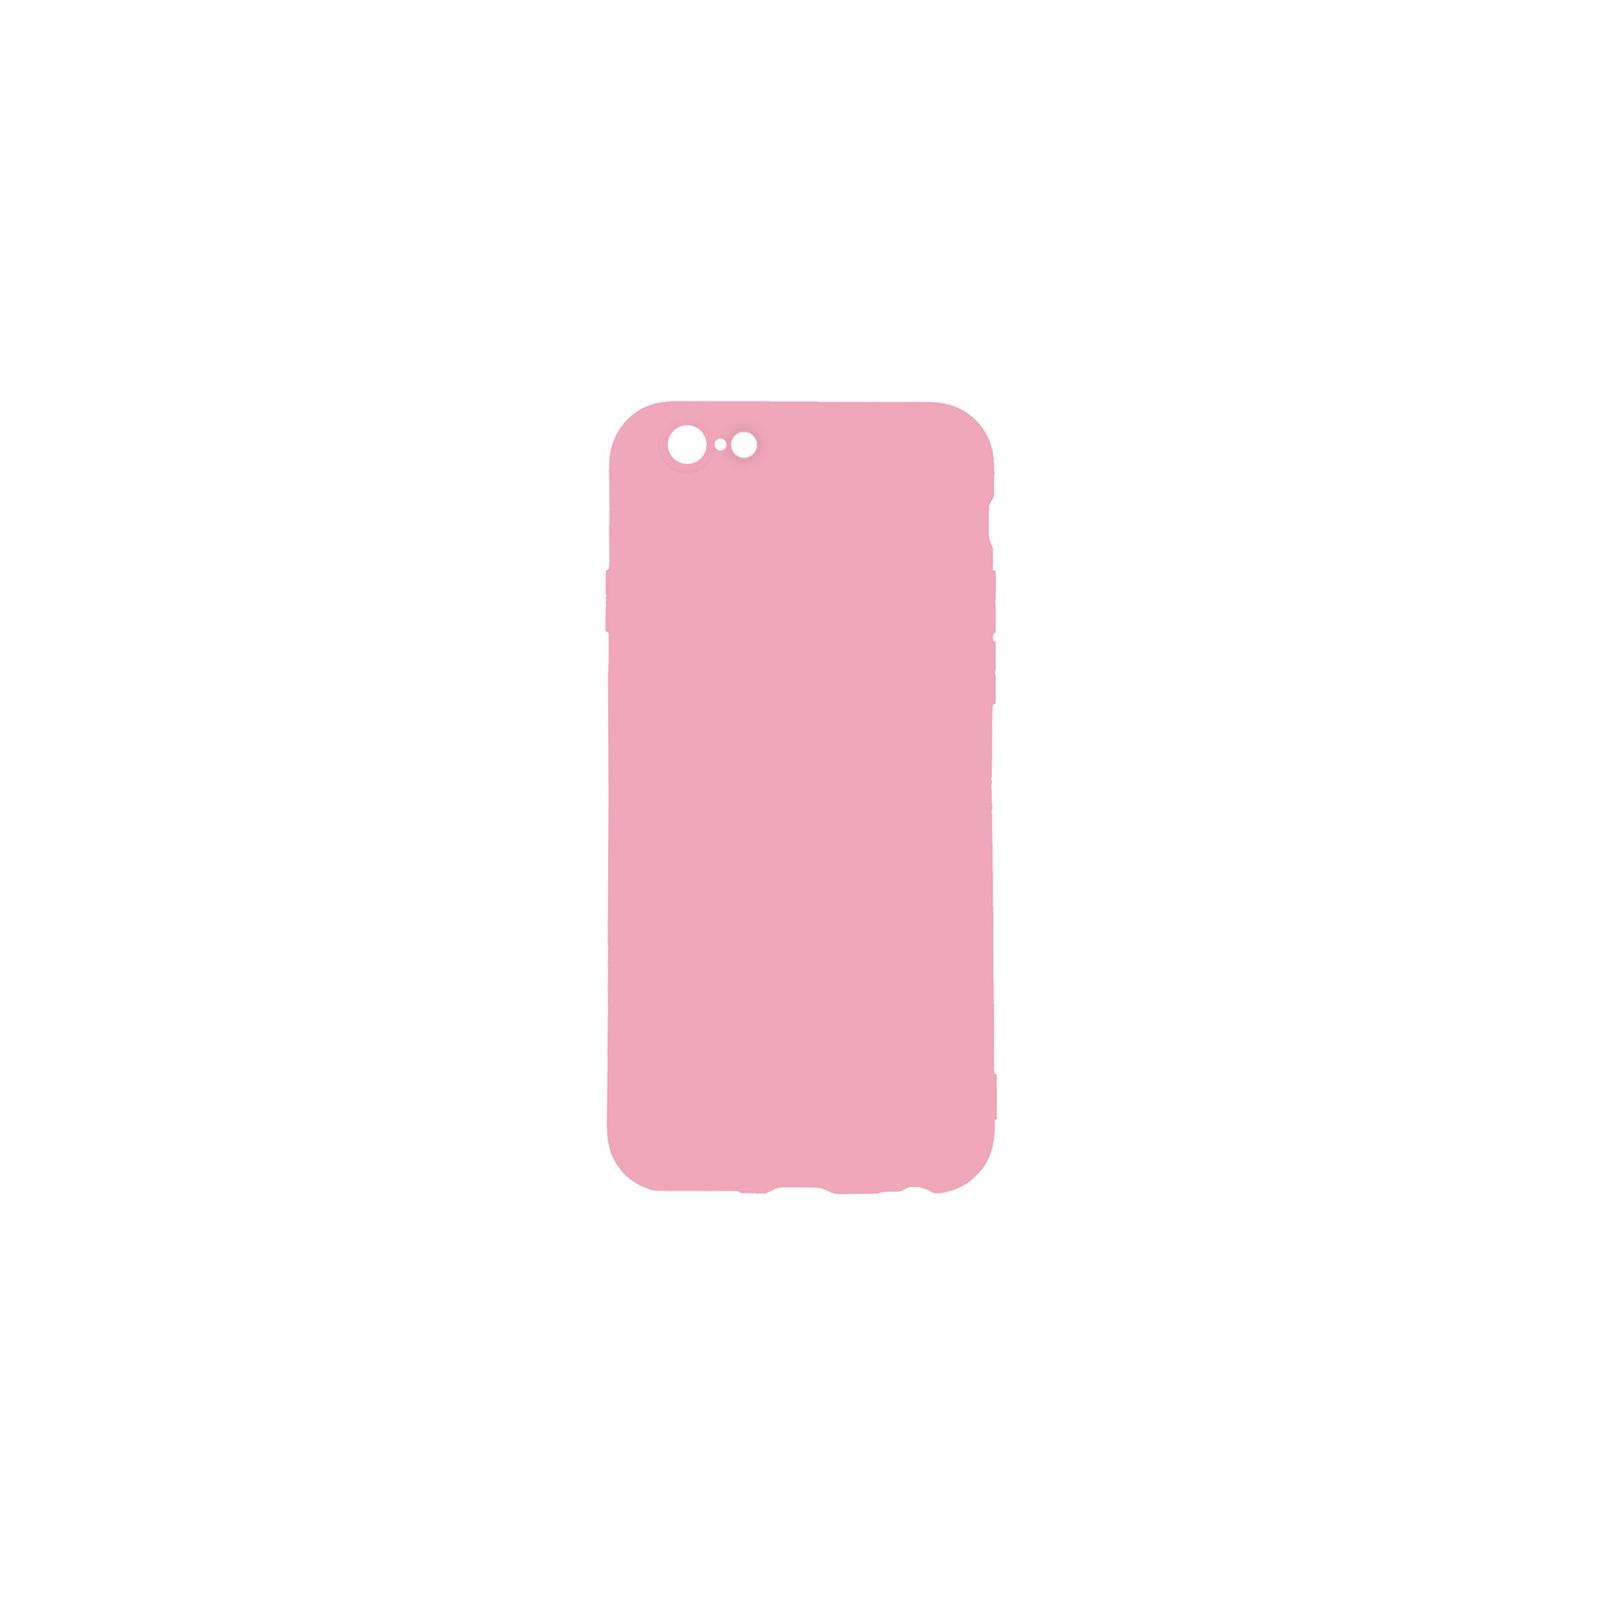 Чехол для моб. телефона Toto 1mm Matt TPU Case Apple iPhone 6 Plus/6s Plus Pink (F_93952)